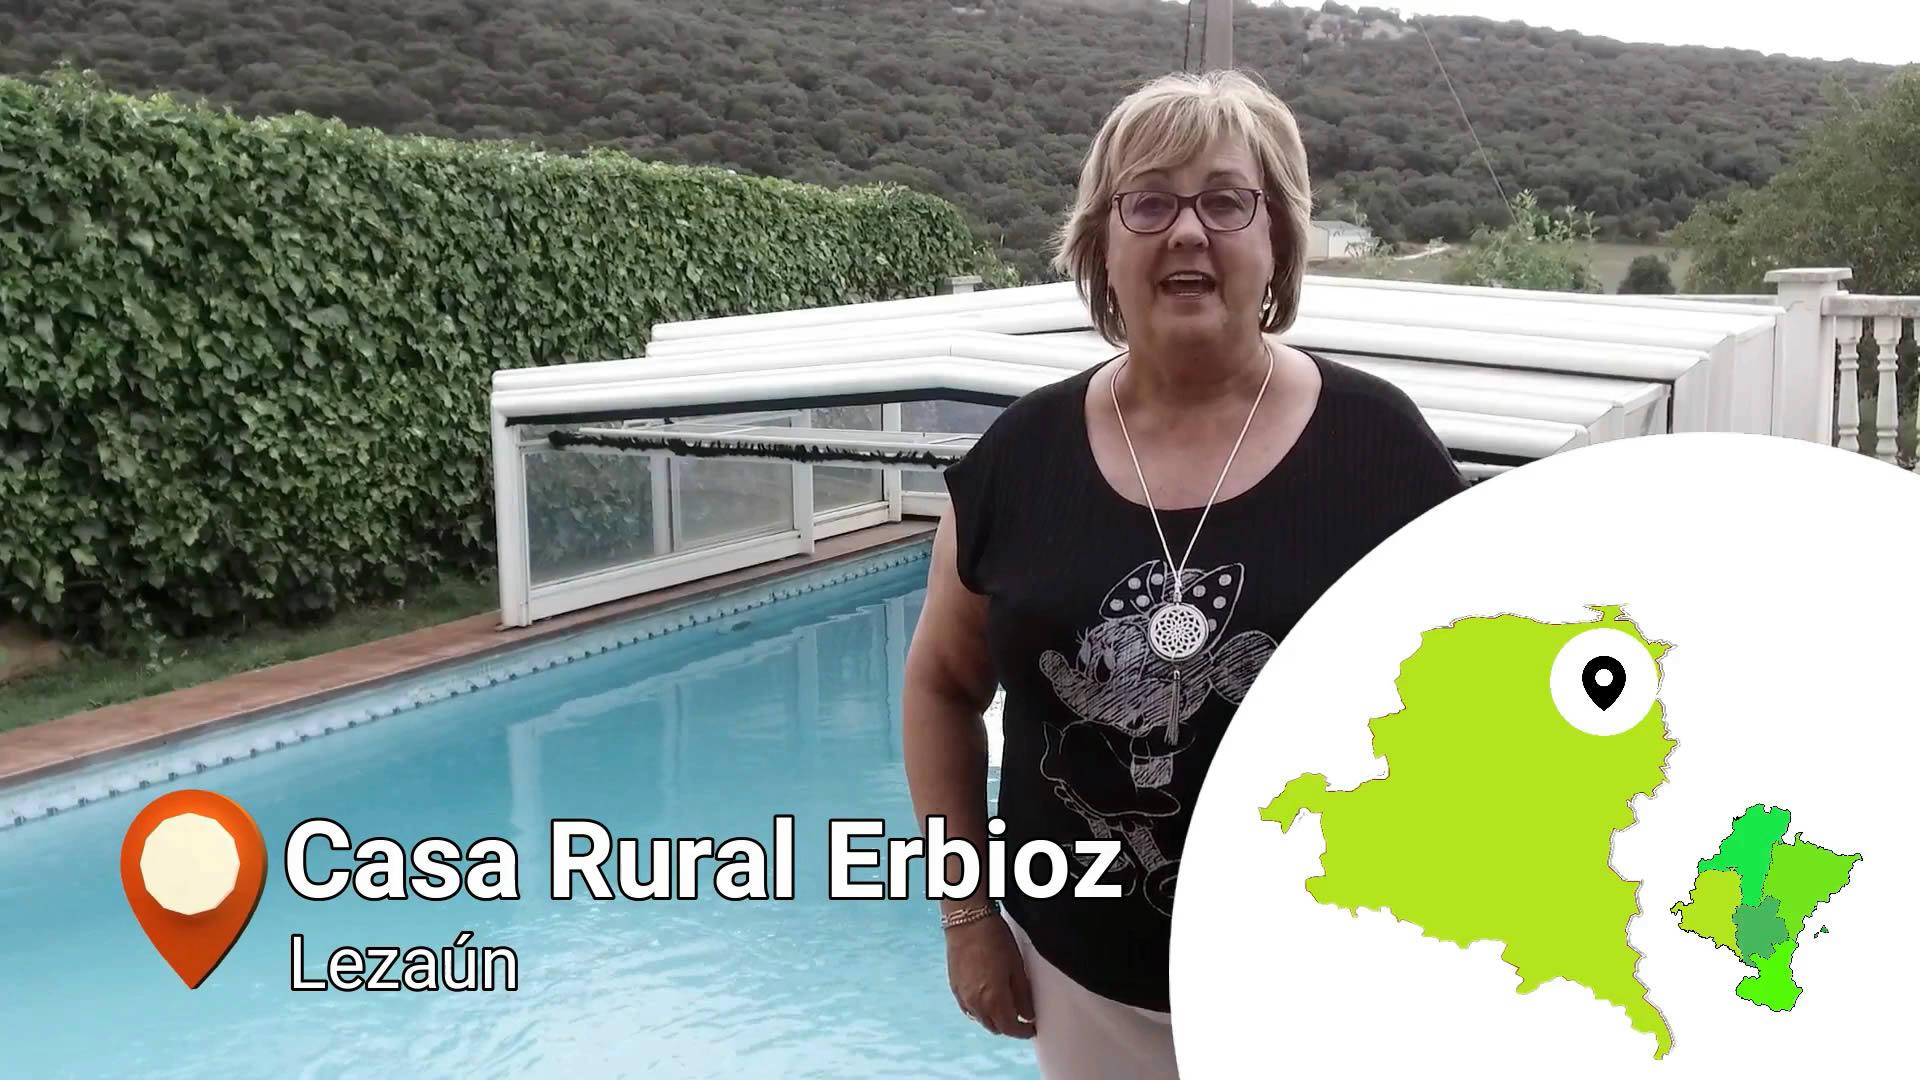 casa-rural-erbioz-turismo-rural-navarra-tierras-de-iranzu.mp4